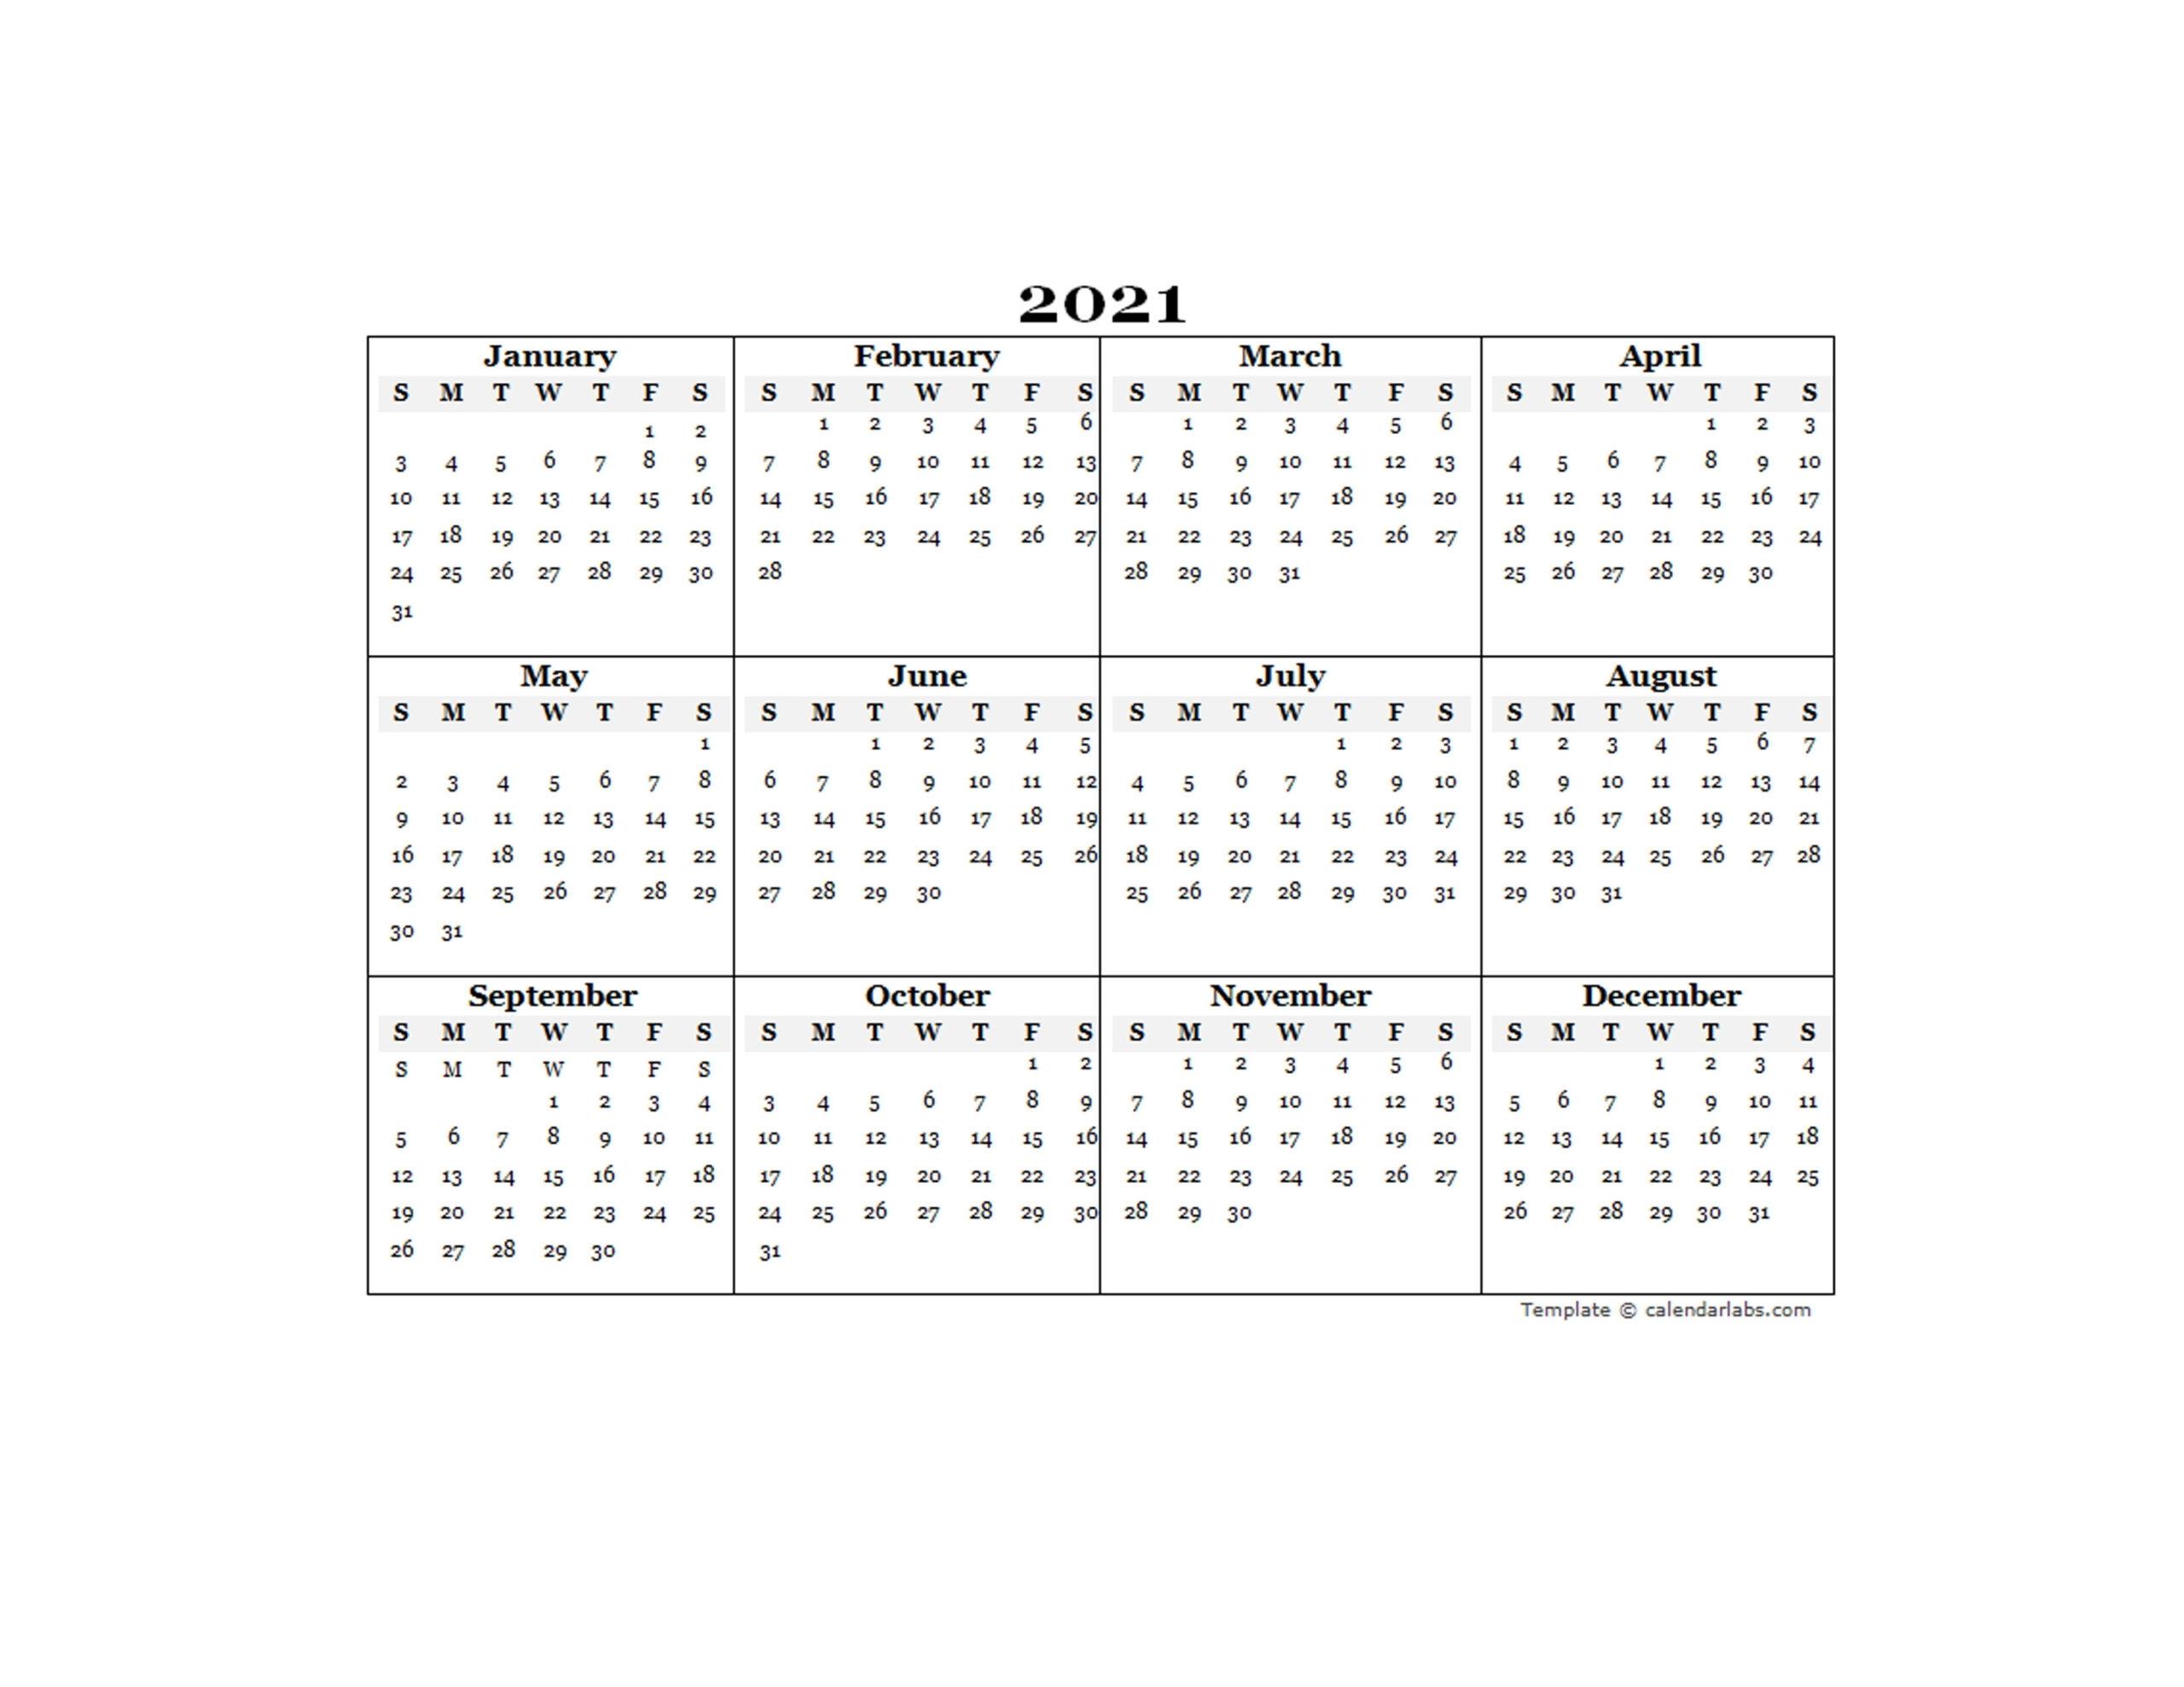 Fiscal Year 2021 Calendar Excel